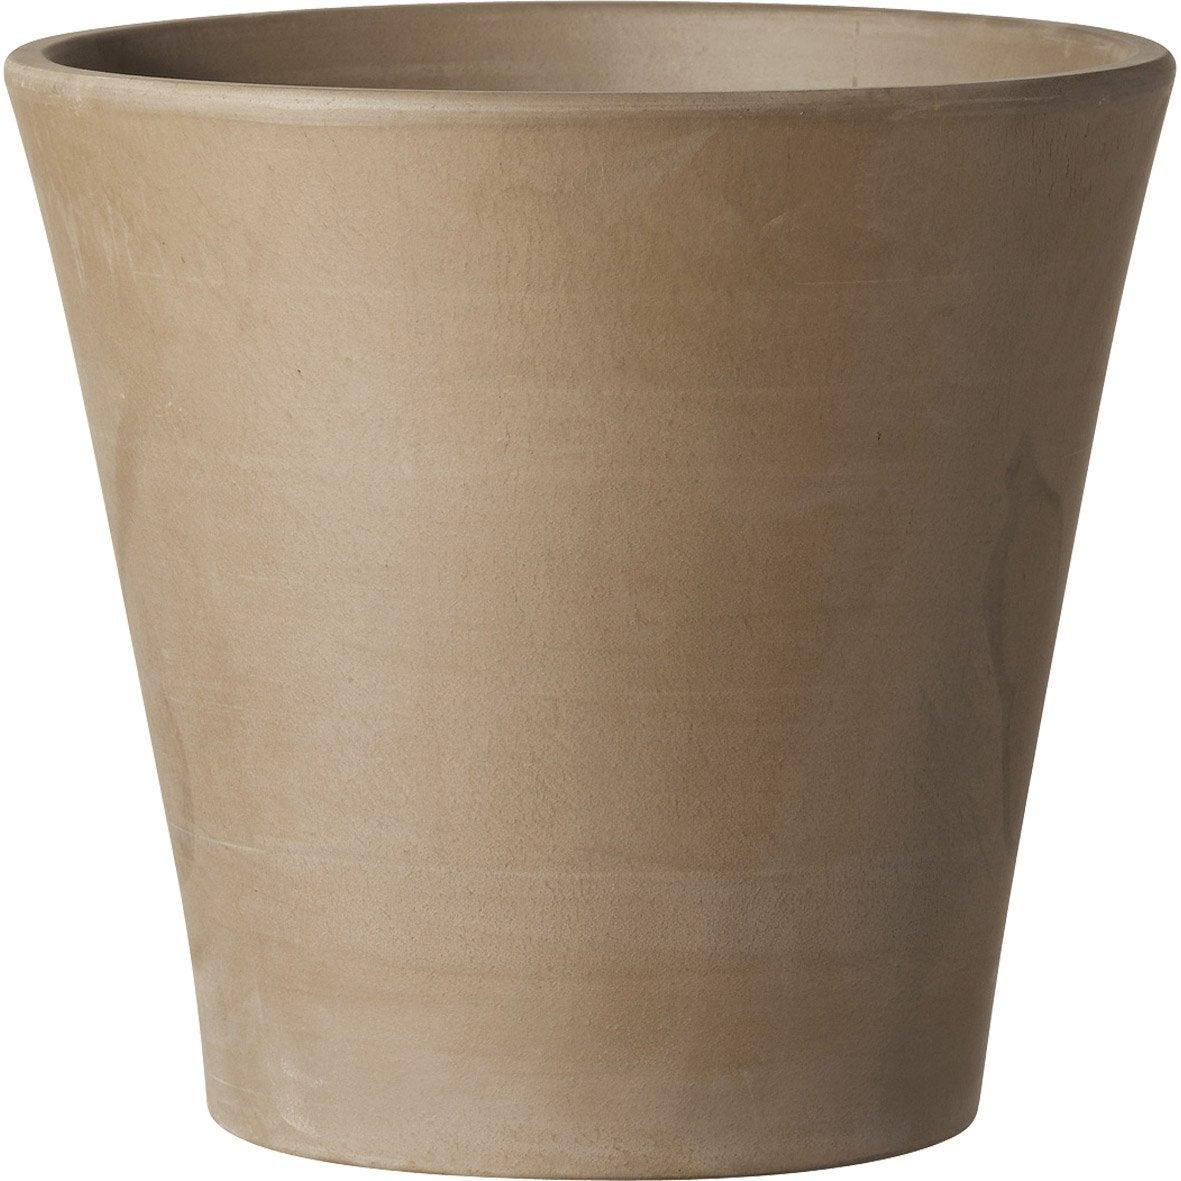 Pot terre cuite deroma x cm chocolat leroy merlin - Pot de fleur lumineux leroy merlin ...